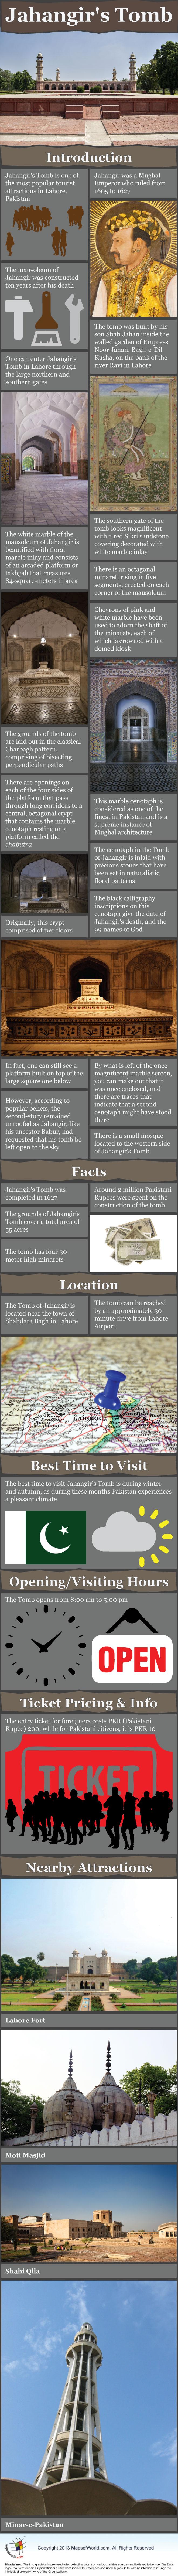 Jahangirs Tomb Infographic